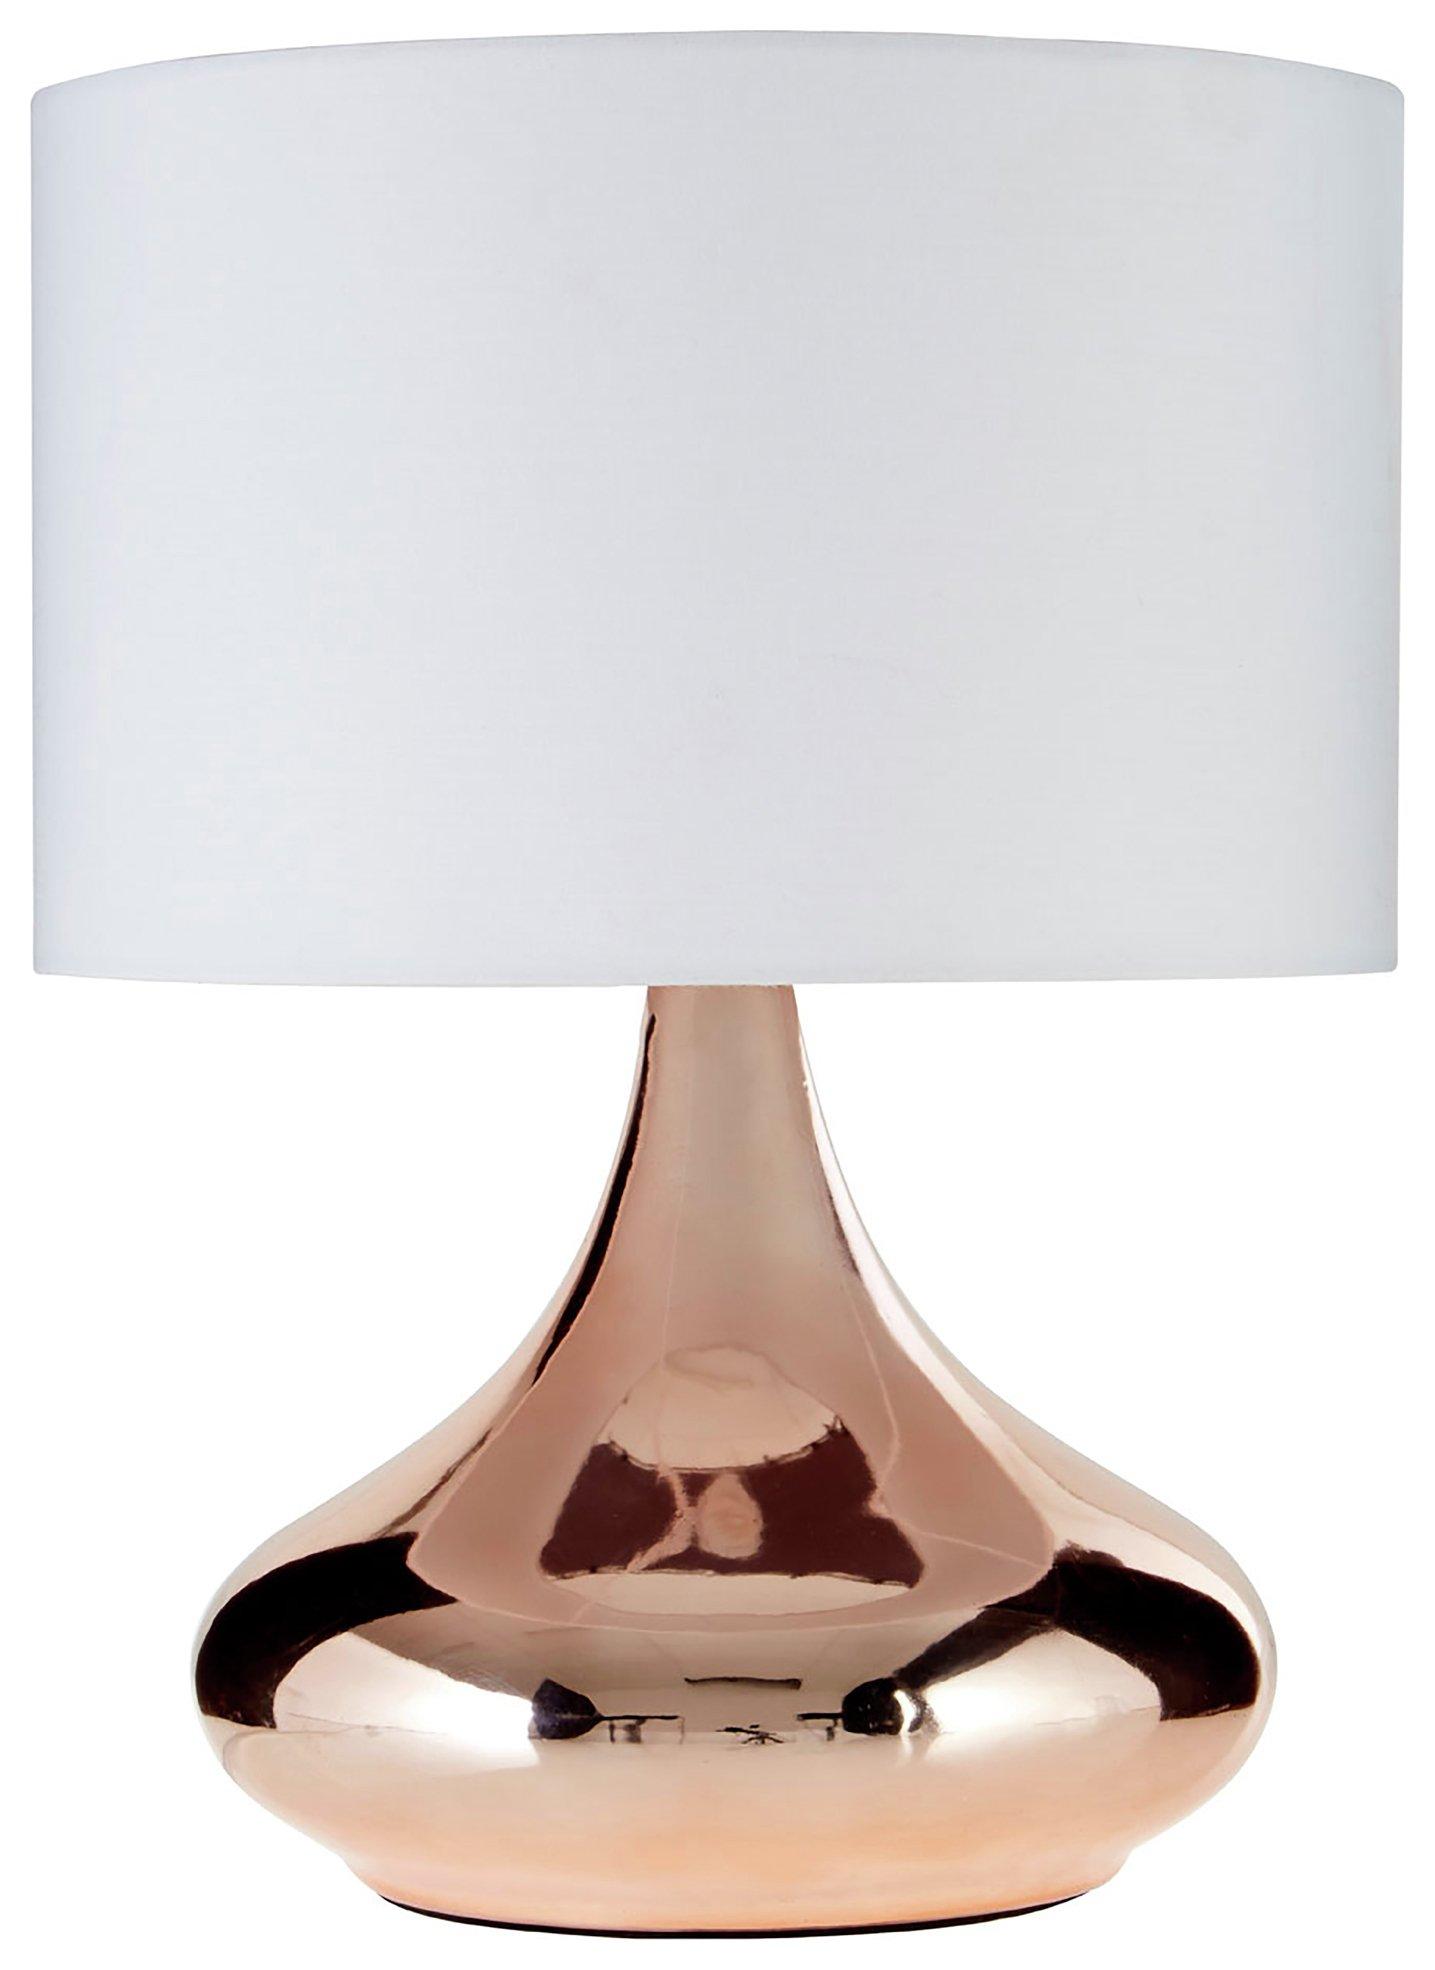 Image of Jaden - Ceramic - Table Lamp - Ivory